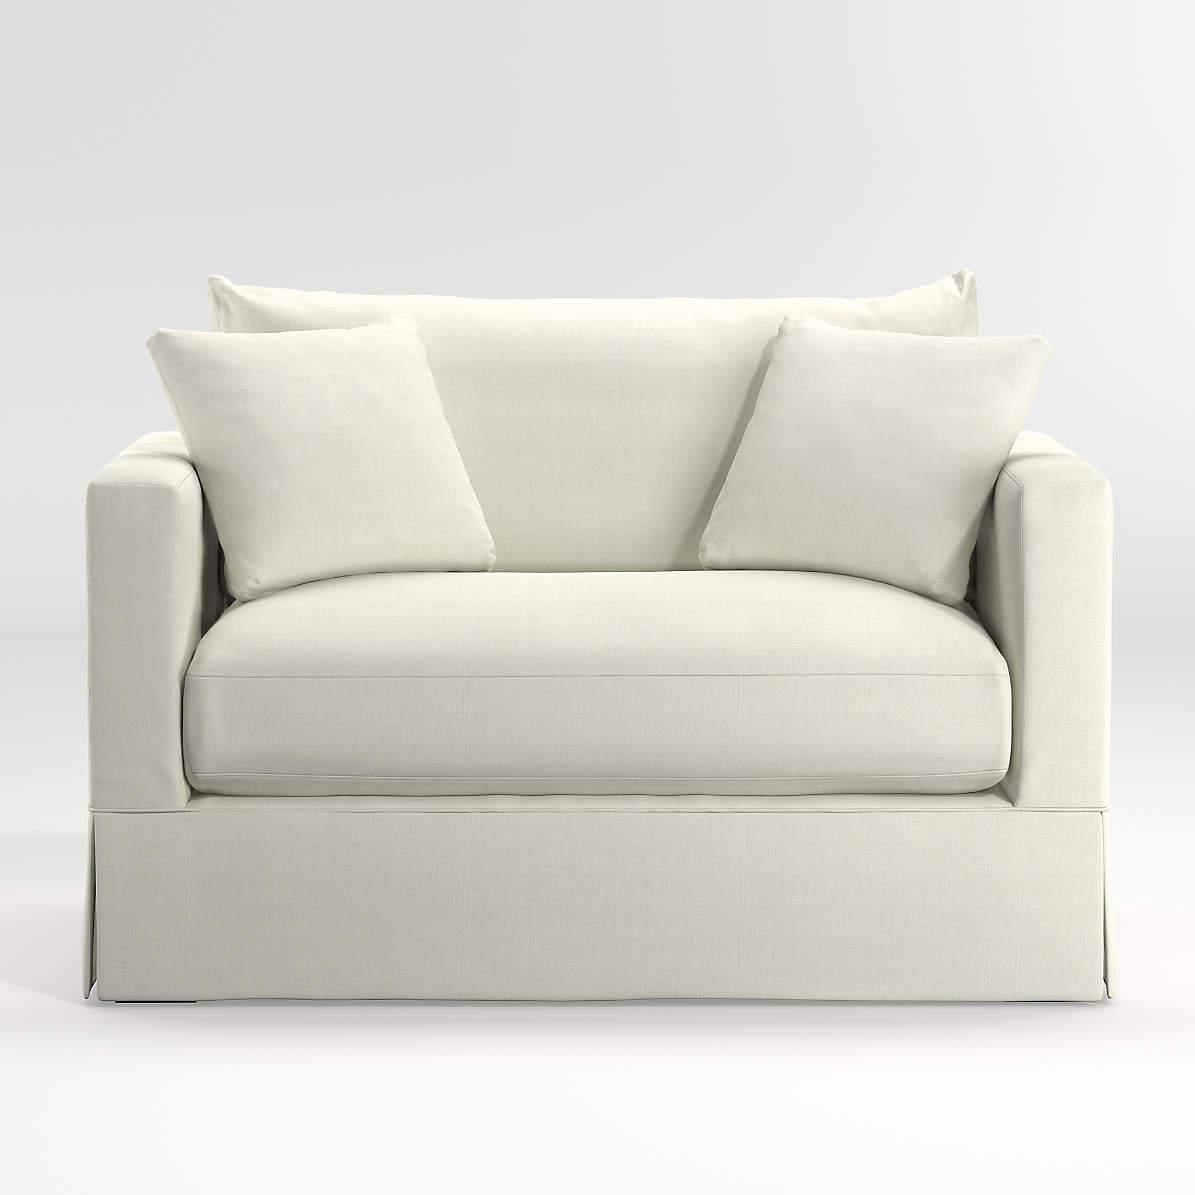 Willow White Twin Sleeper Sofa